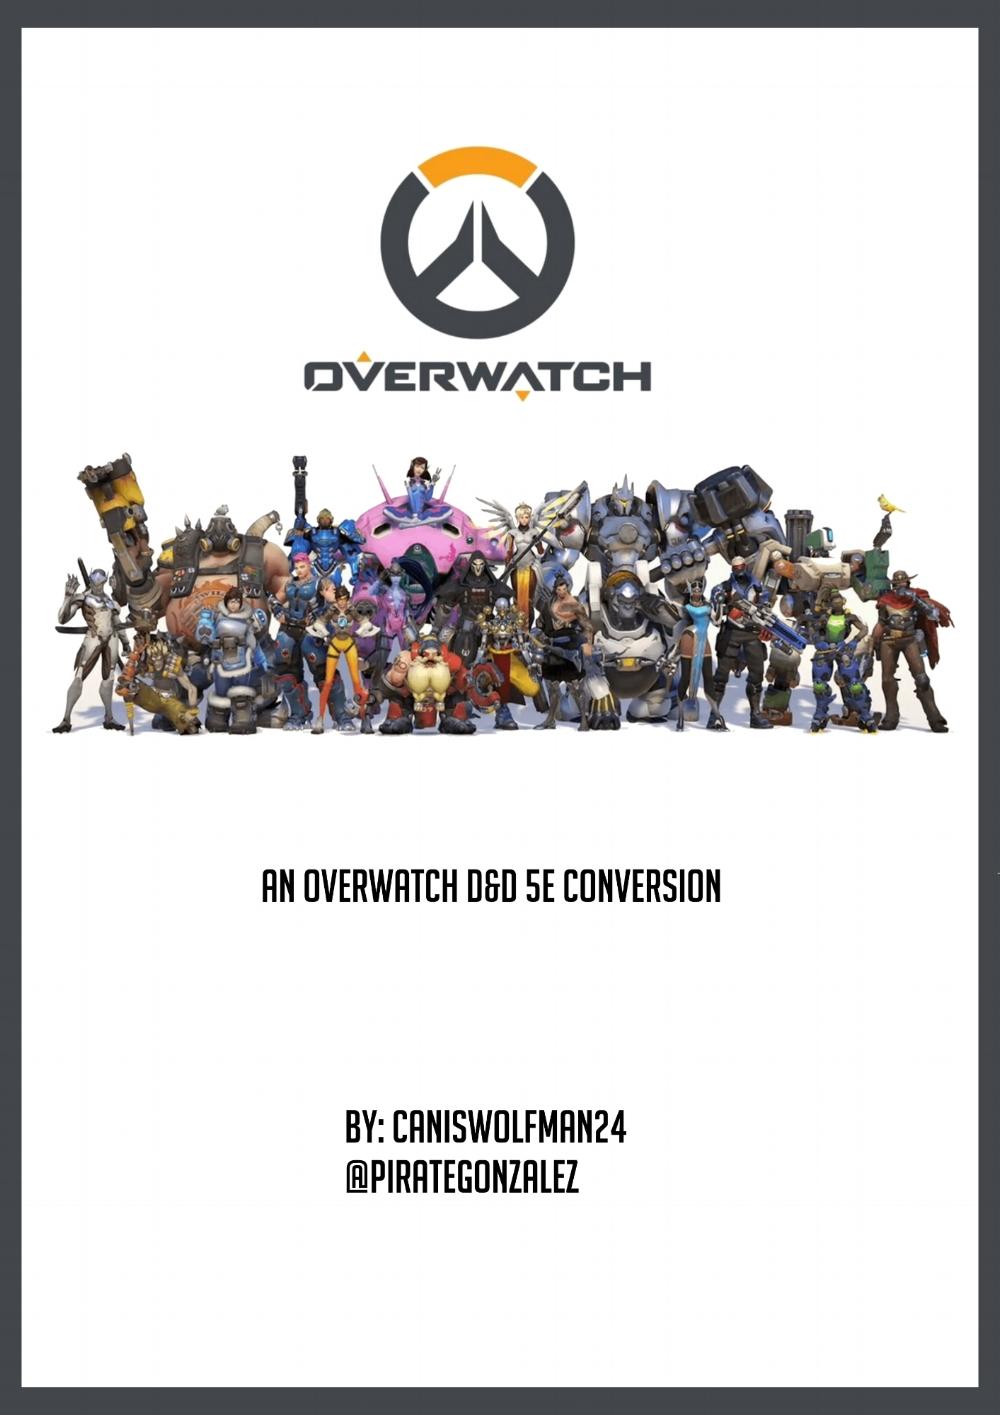 001 overwatch cover.jpg